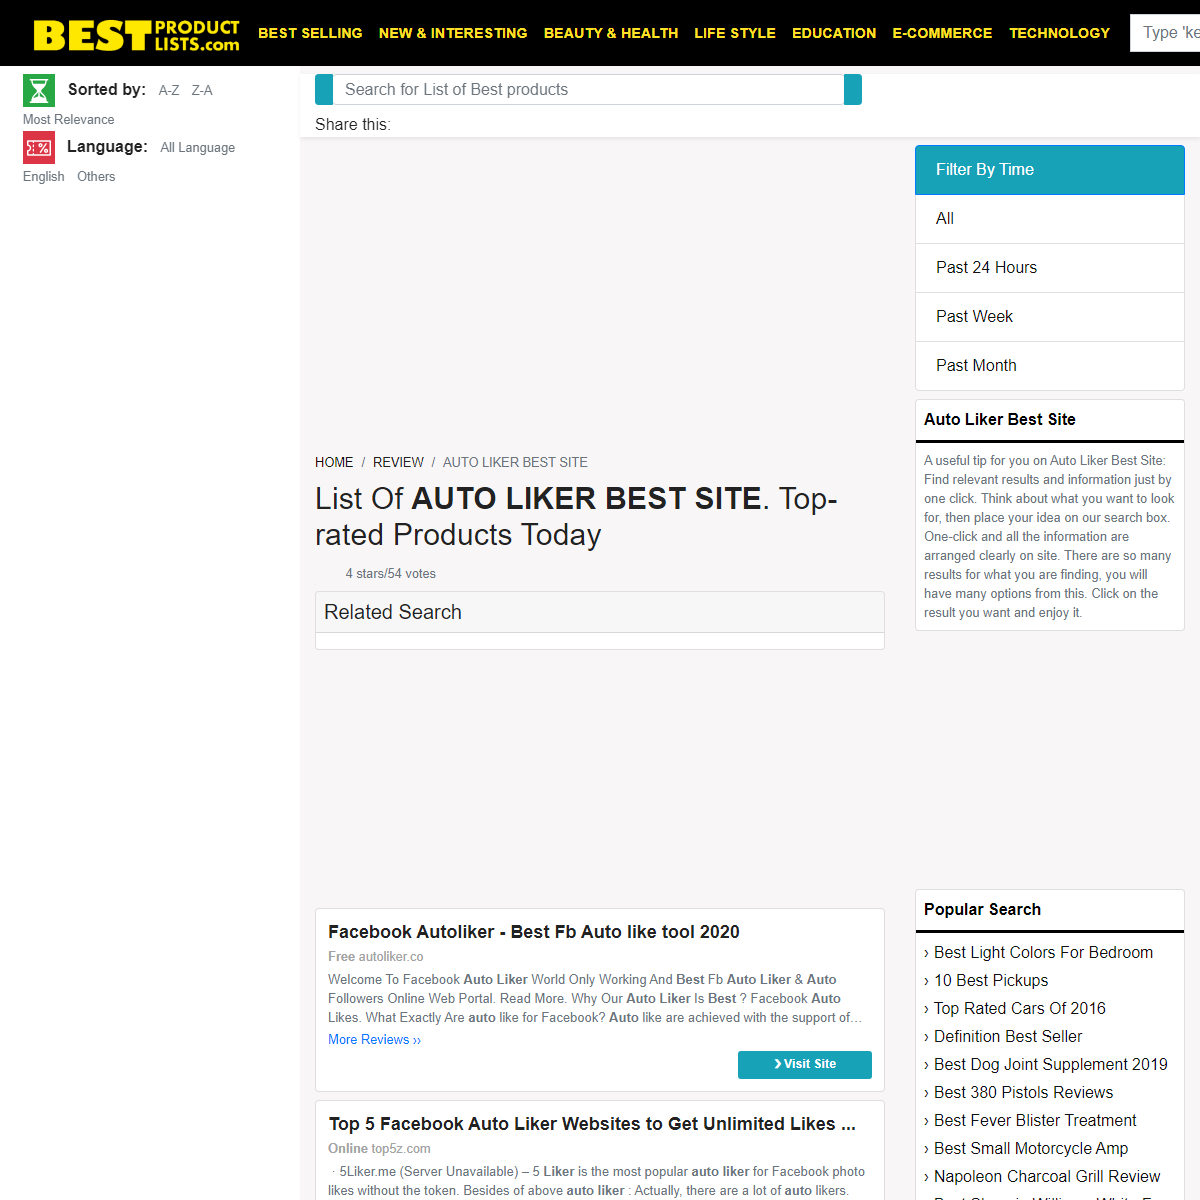 Auto Liker Best Site - 03-2021